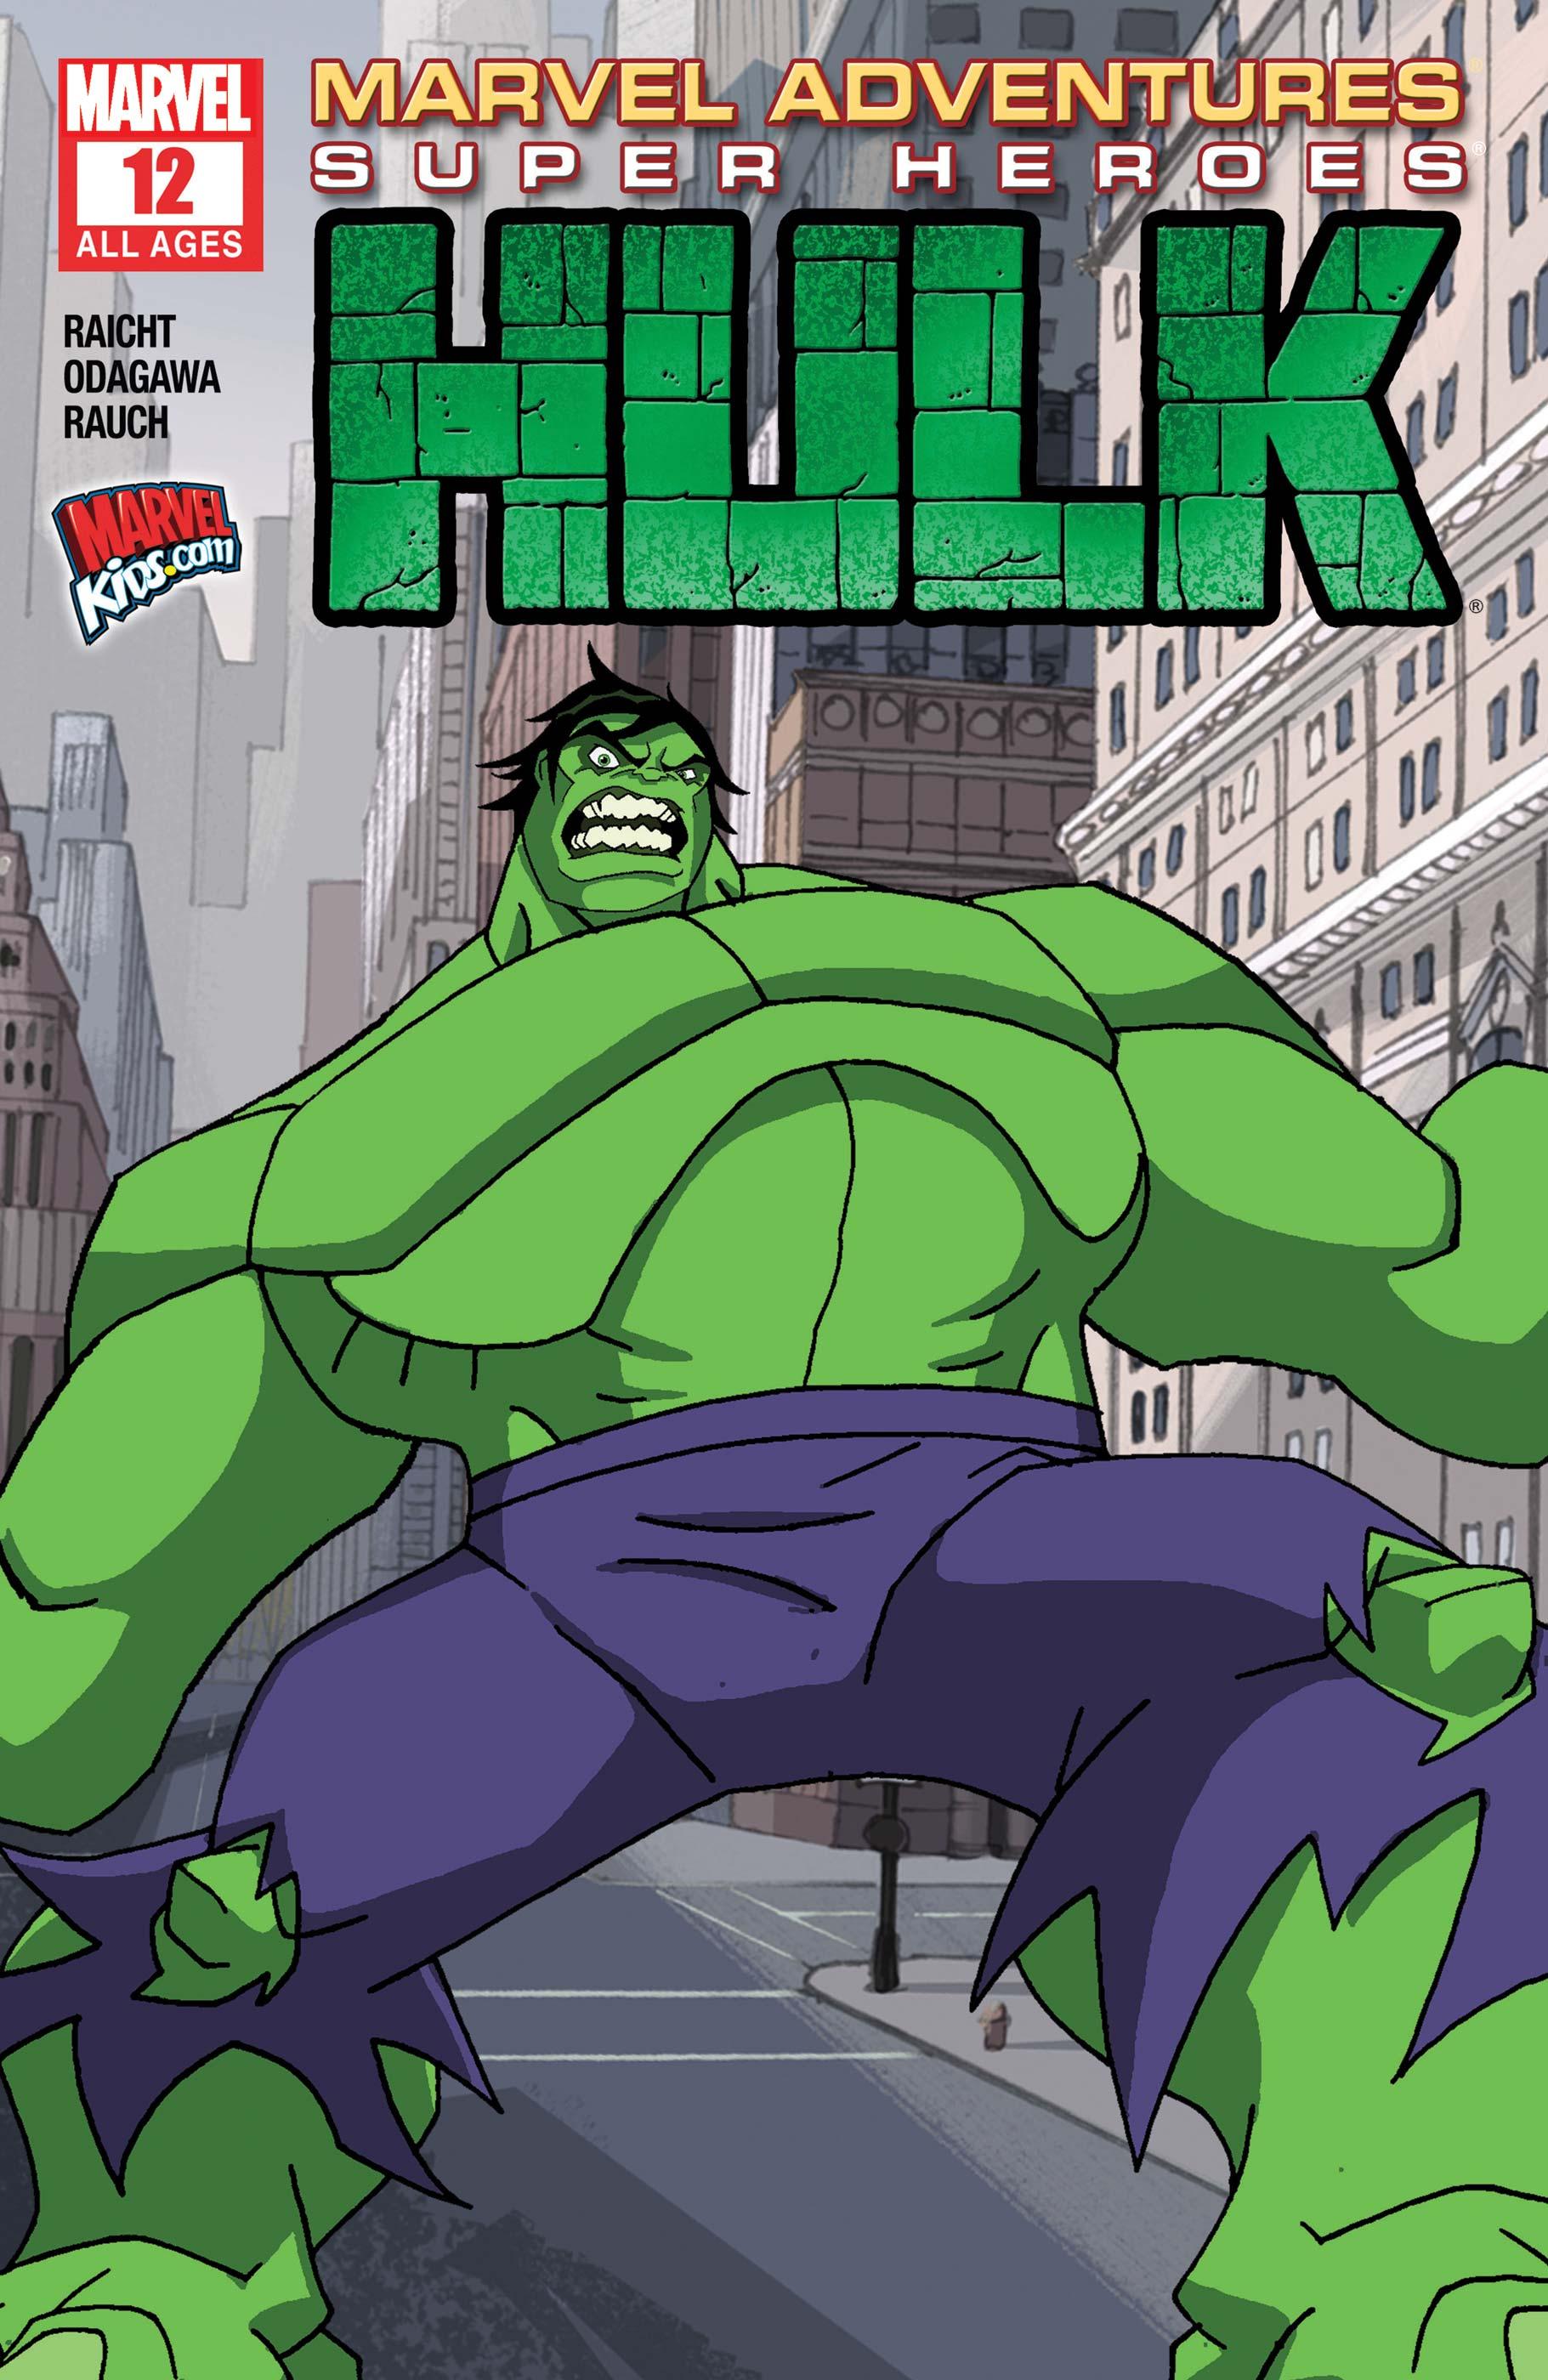 Marvel Adventures Super Heroes (2010) #12